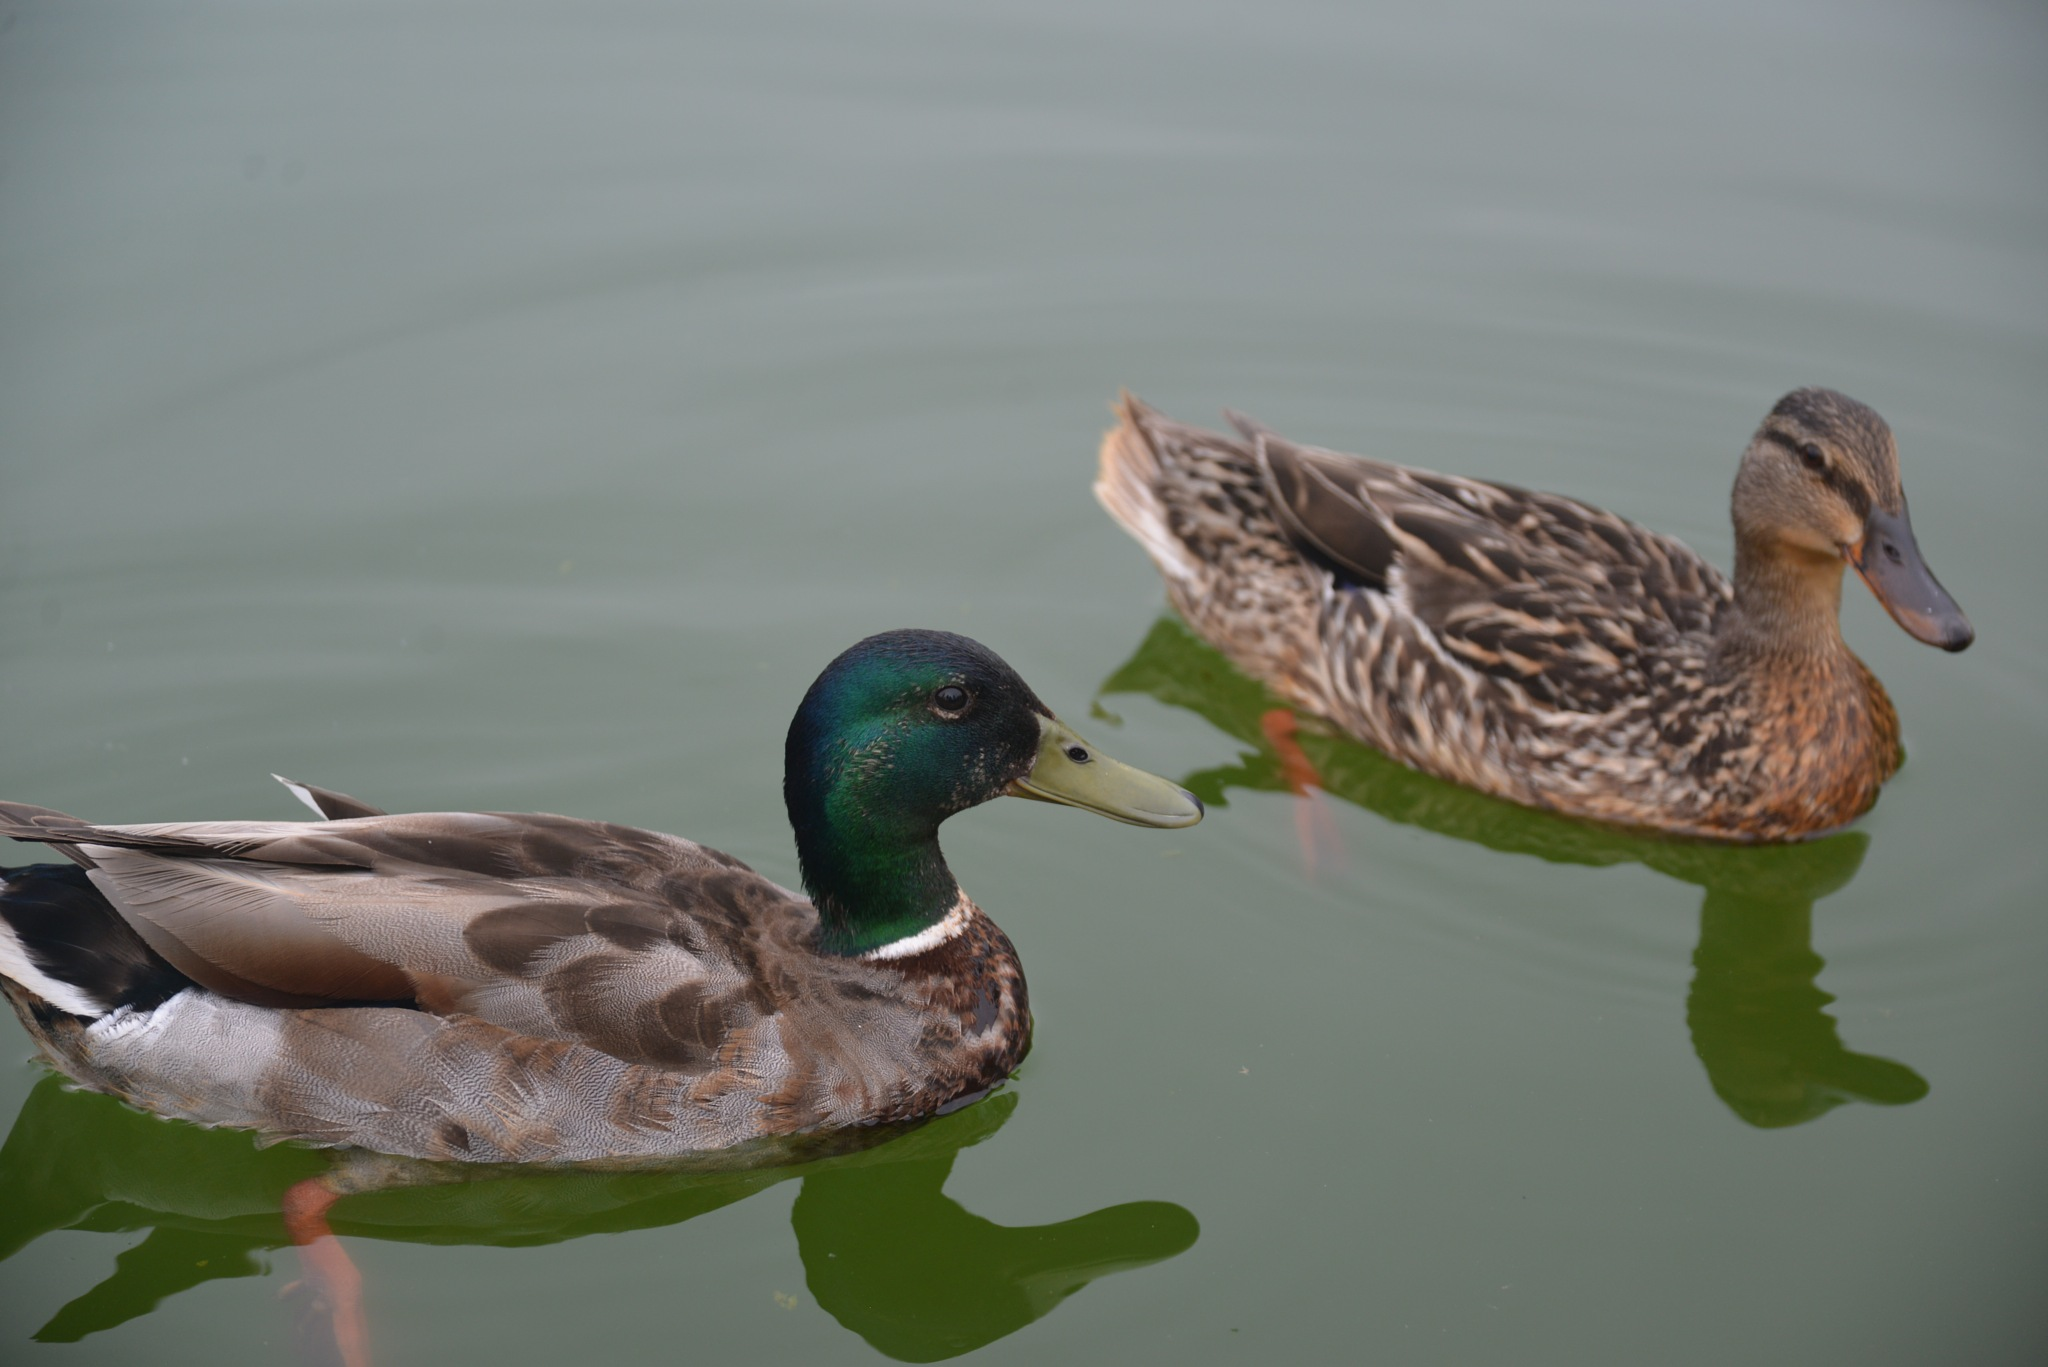 Ducks by Nicholas C.